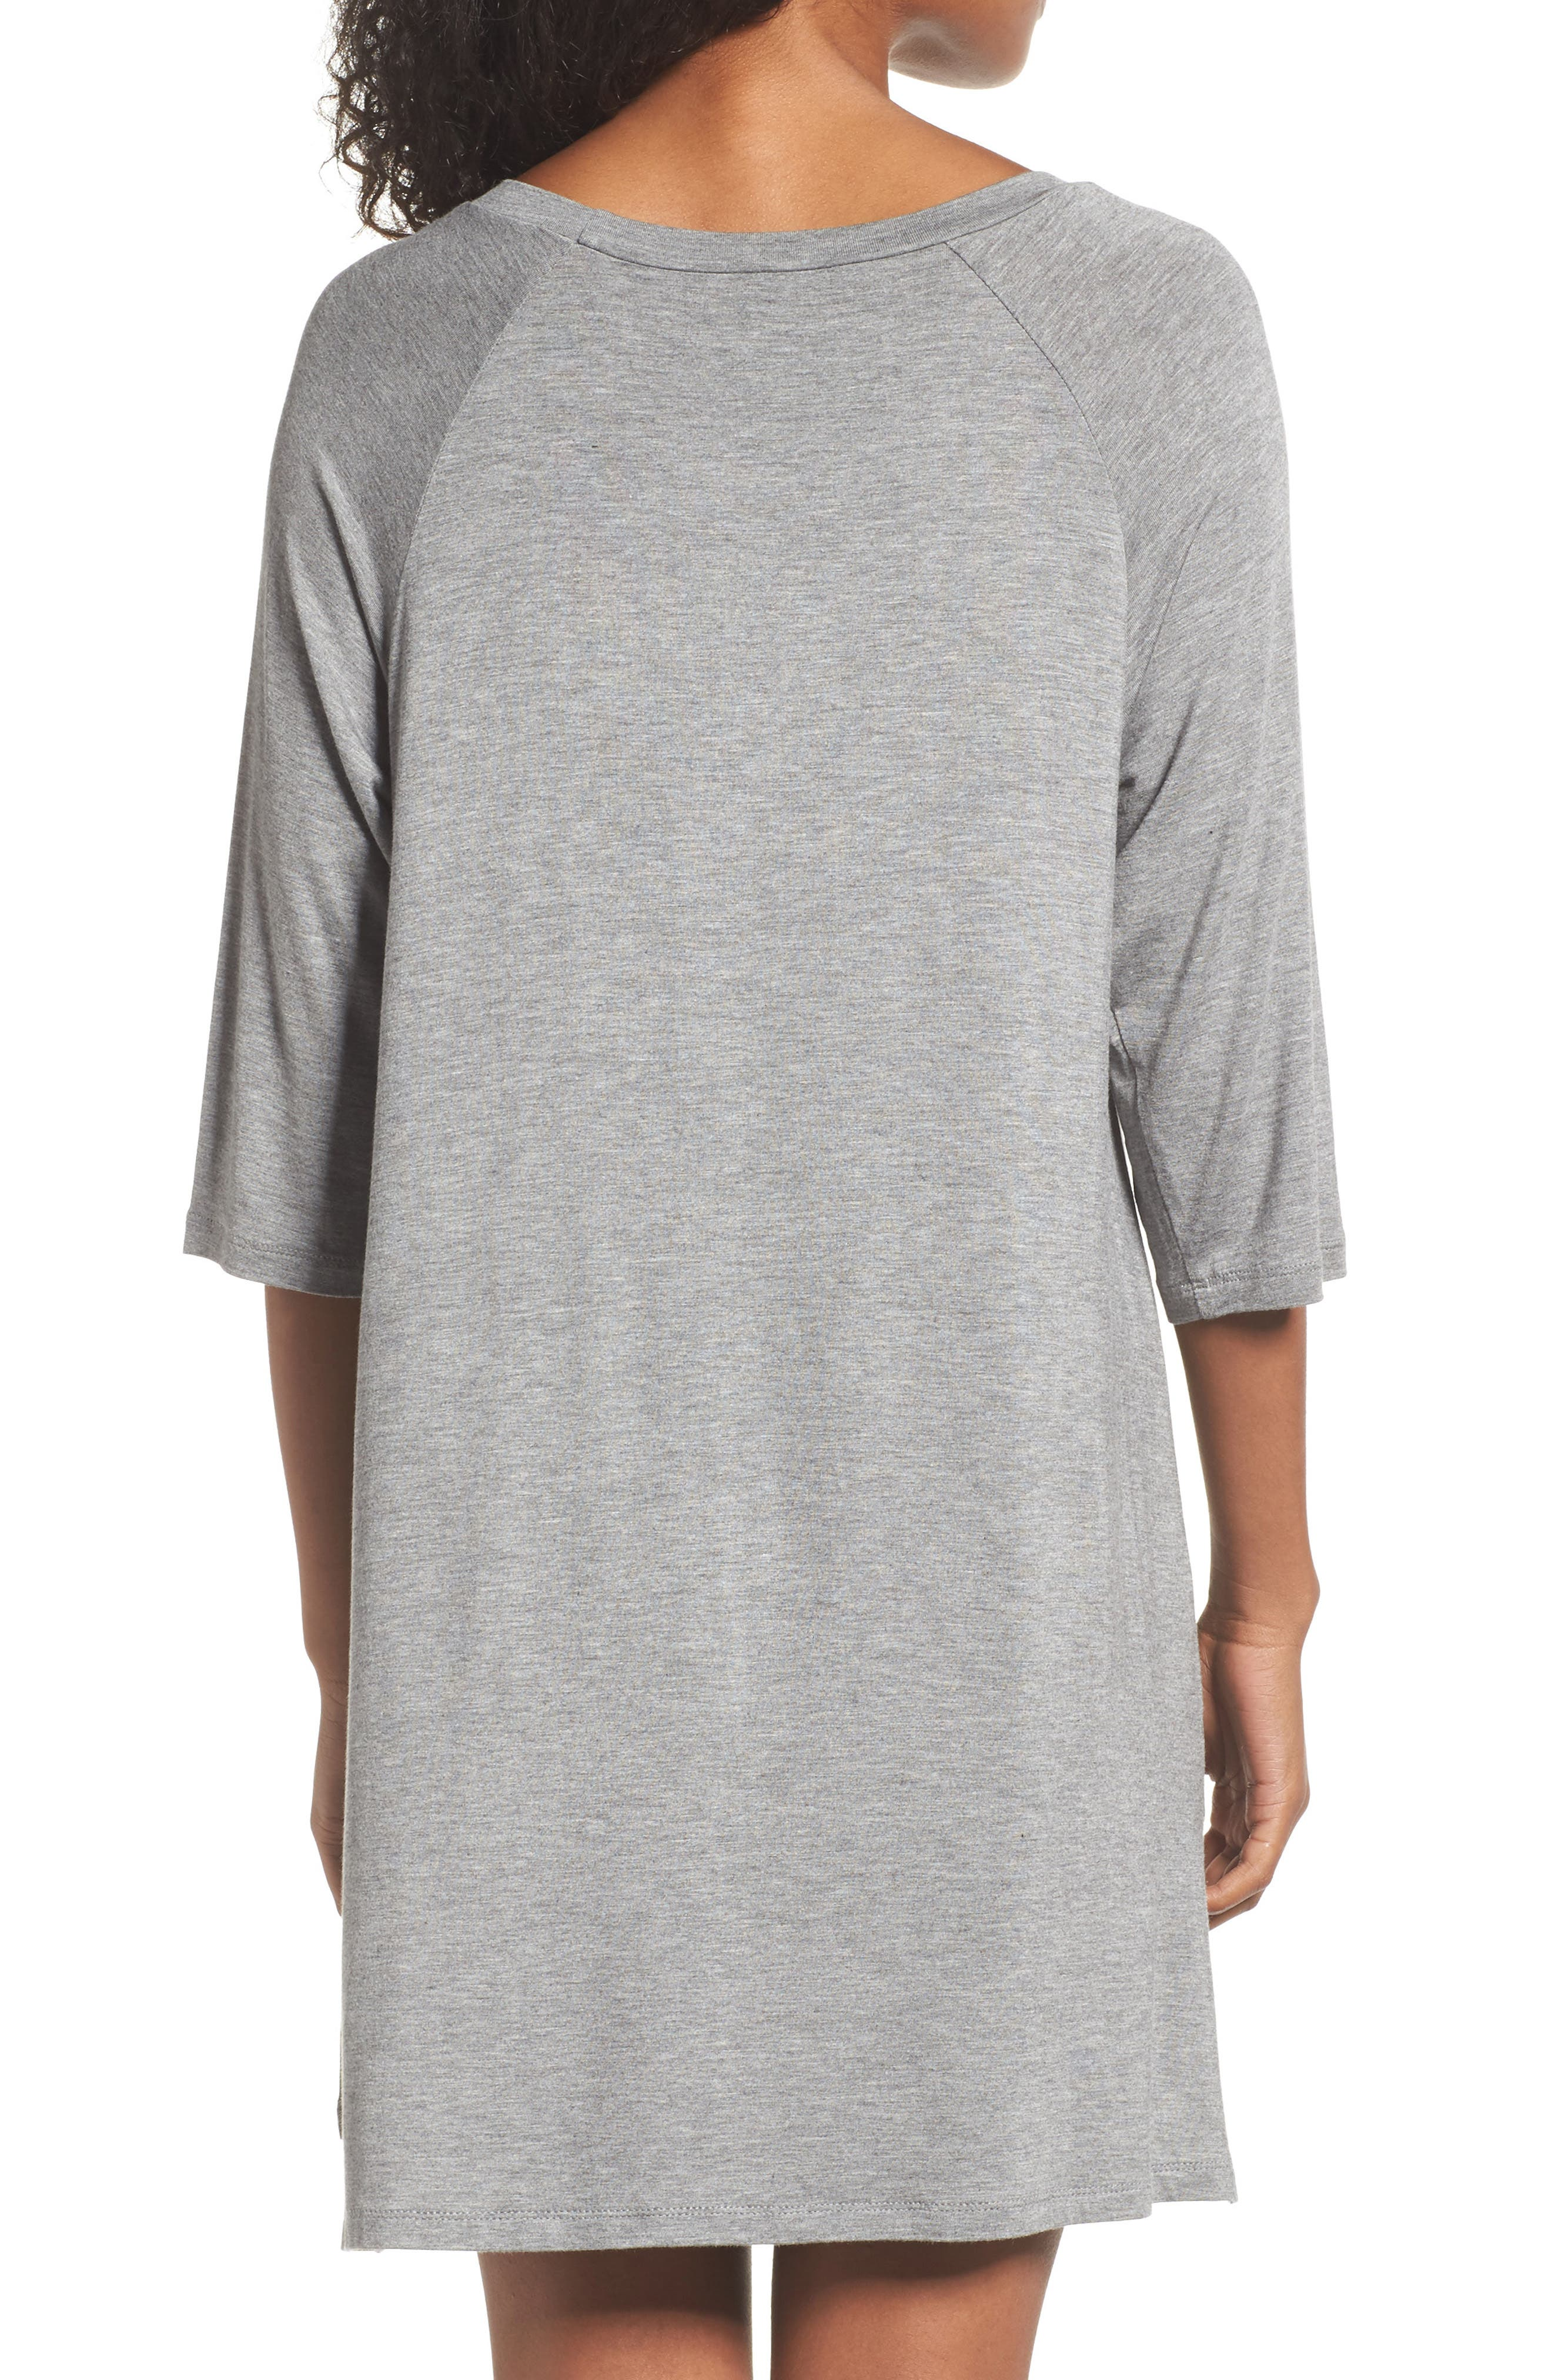 Honeydew All American Sleep Shirt,                             Alternate thumbnail 9, color,